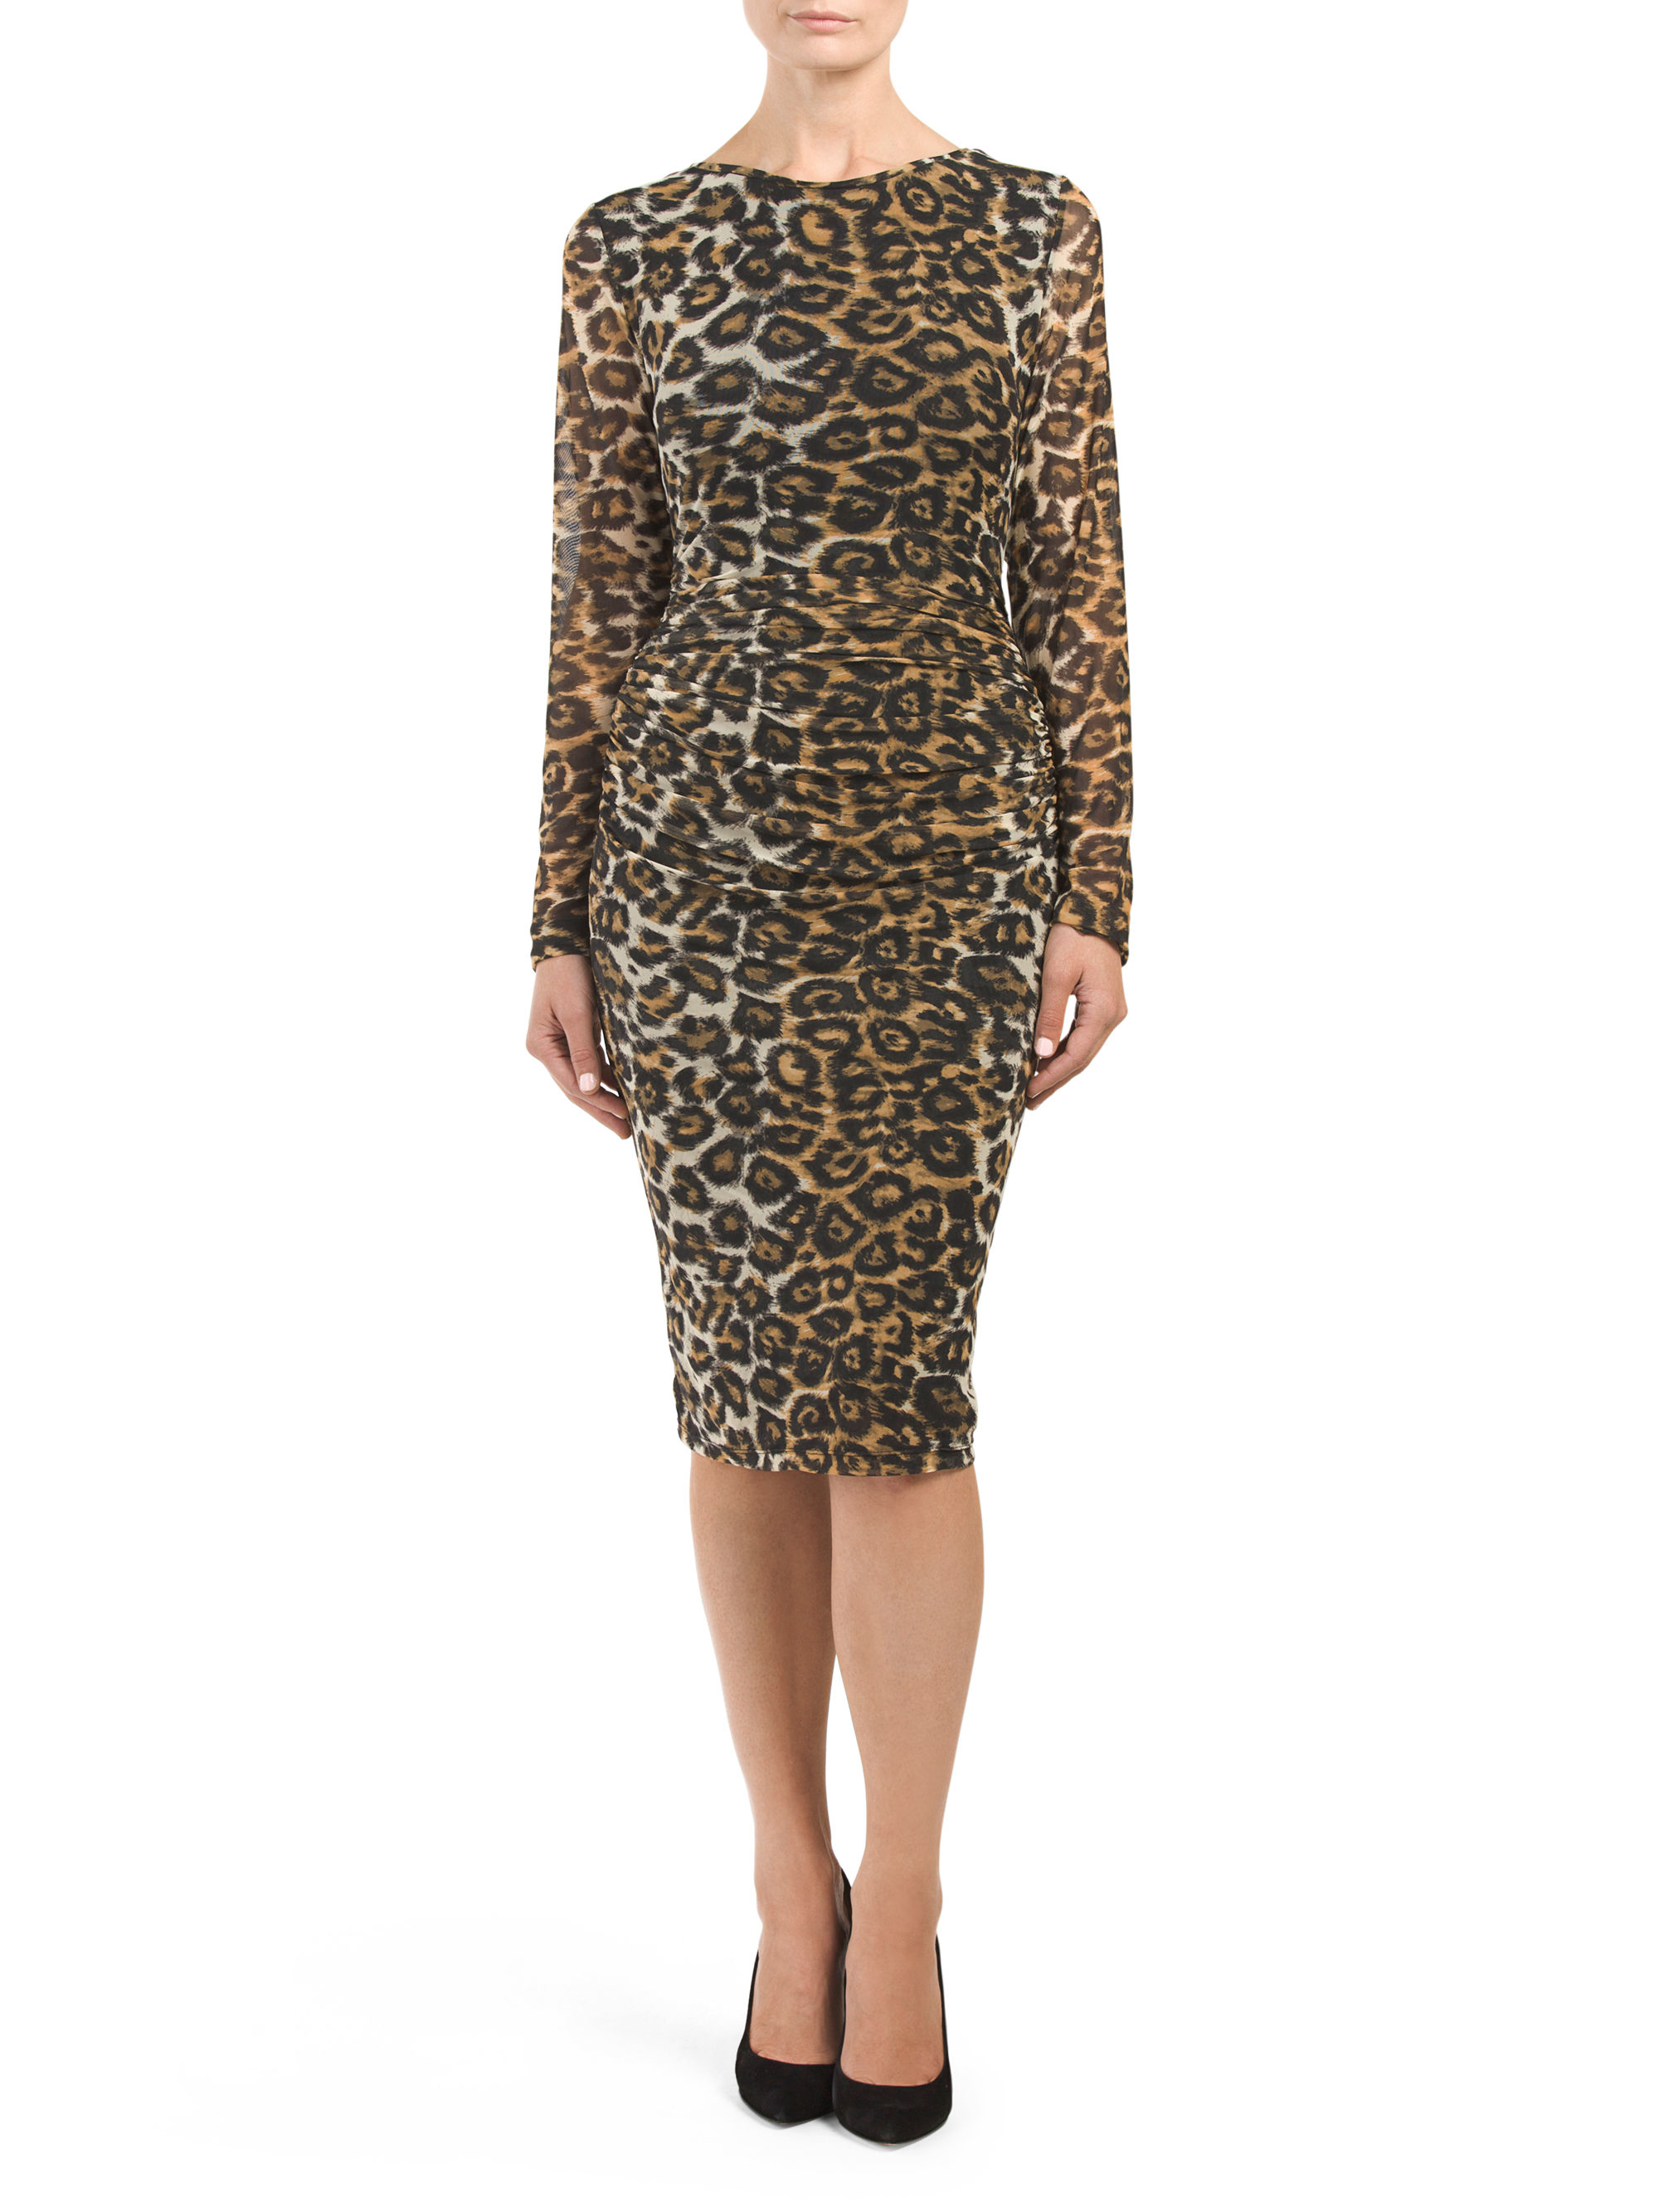 0230fd0e7c5b Lyst - Tj Maxx Cheetah Printed Shirred Dress